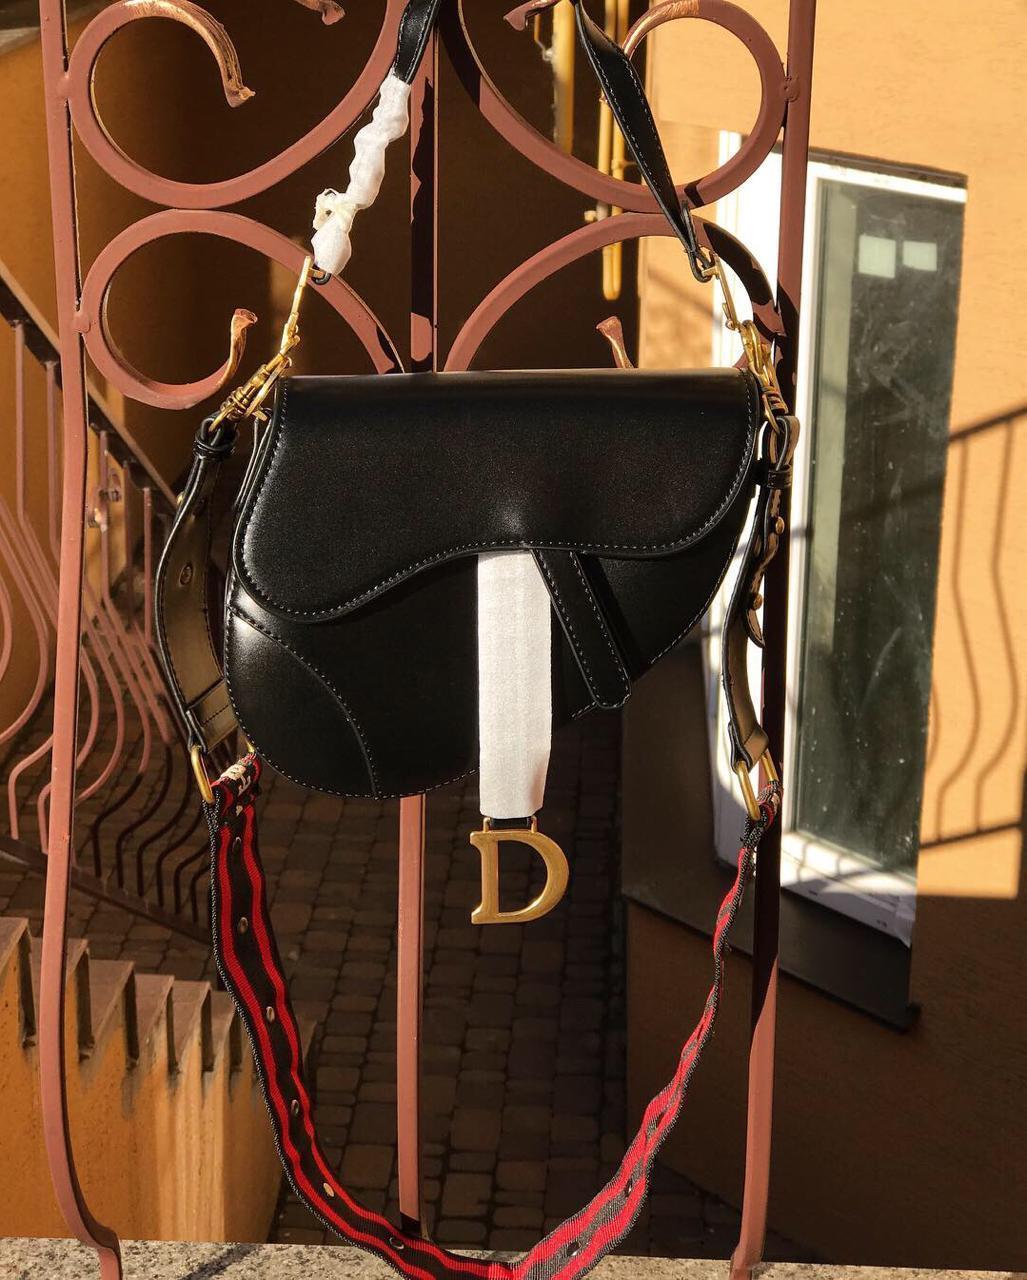 Женская сумочка Dіоr (Диор) SADDLE, черный цвет